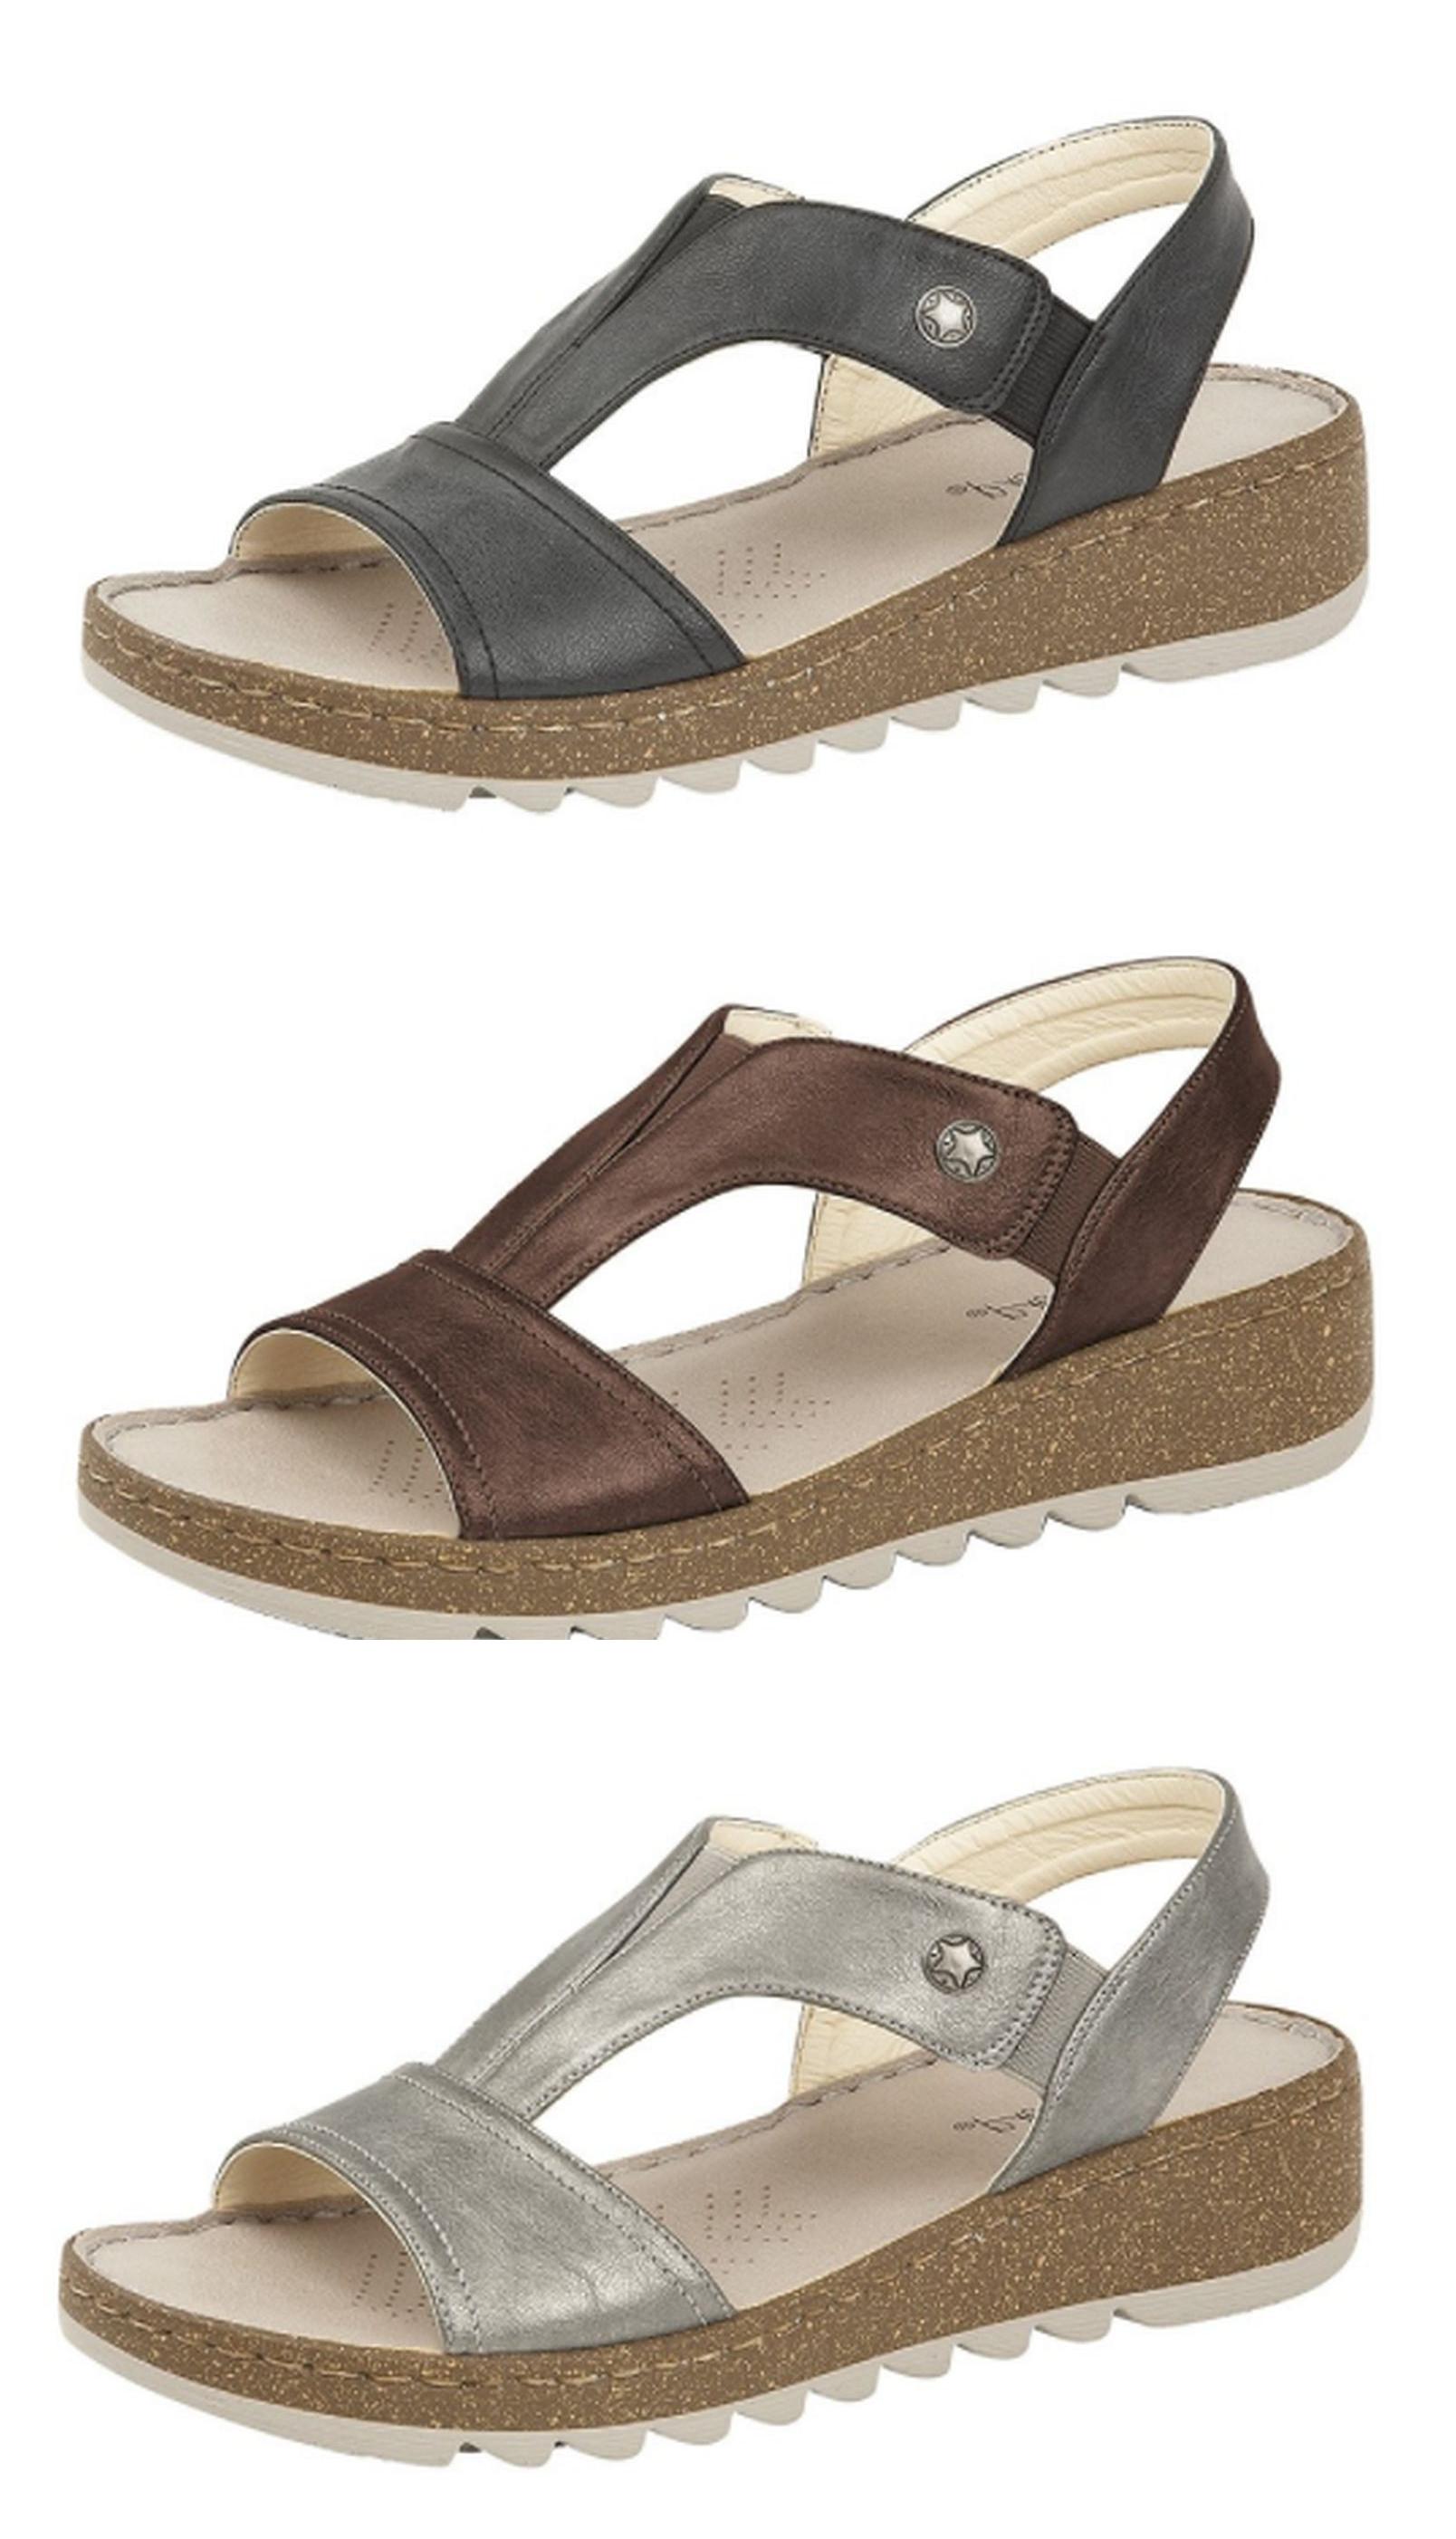 wedge ekam womens b s leather black product river spring sandals sandal t step comforter women comfort strap